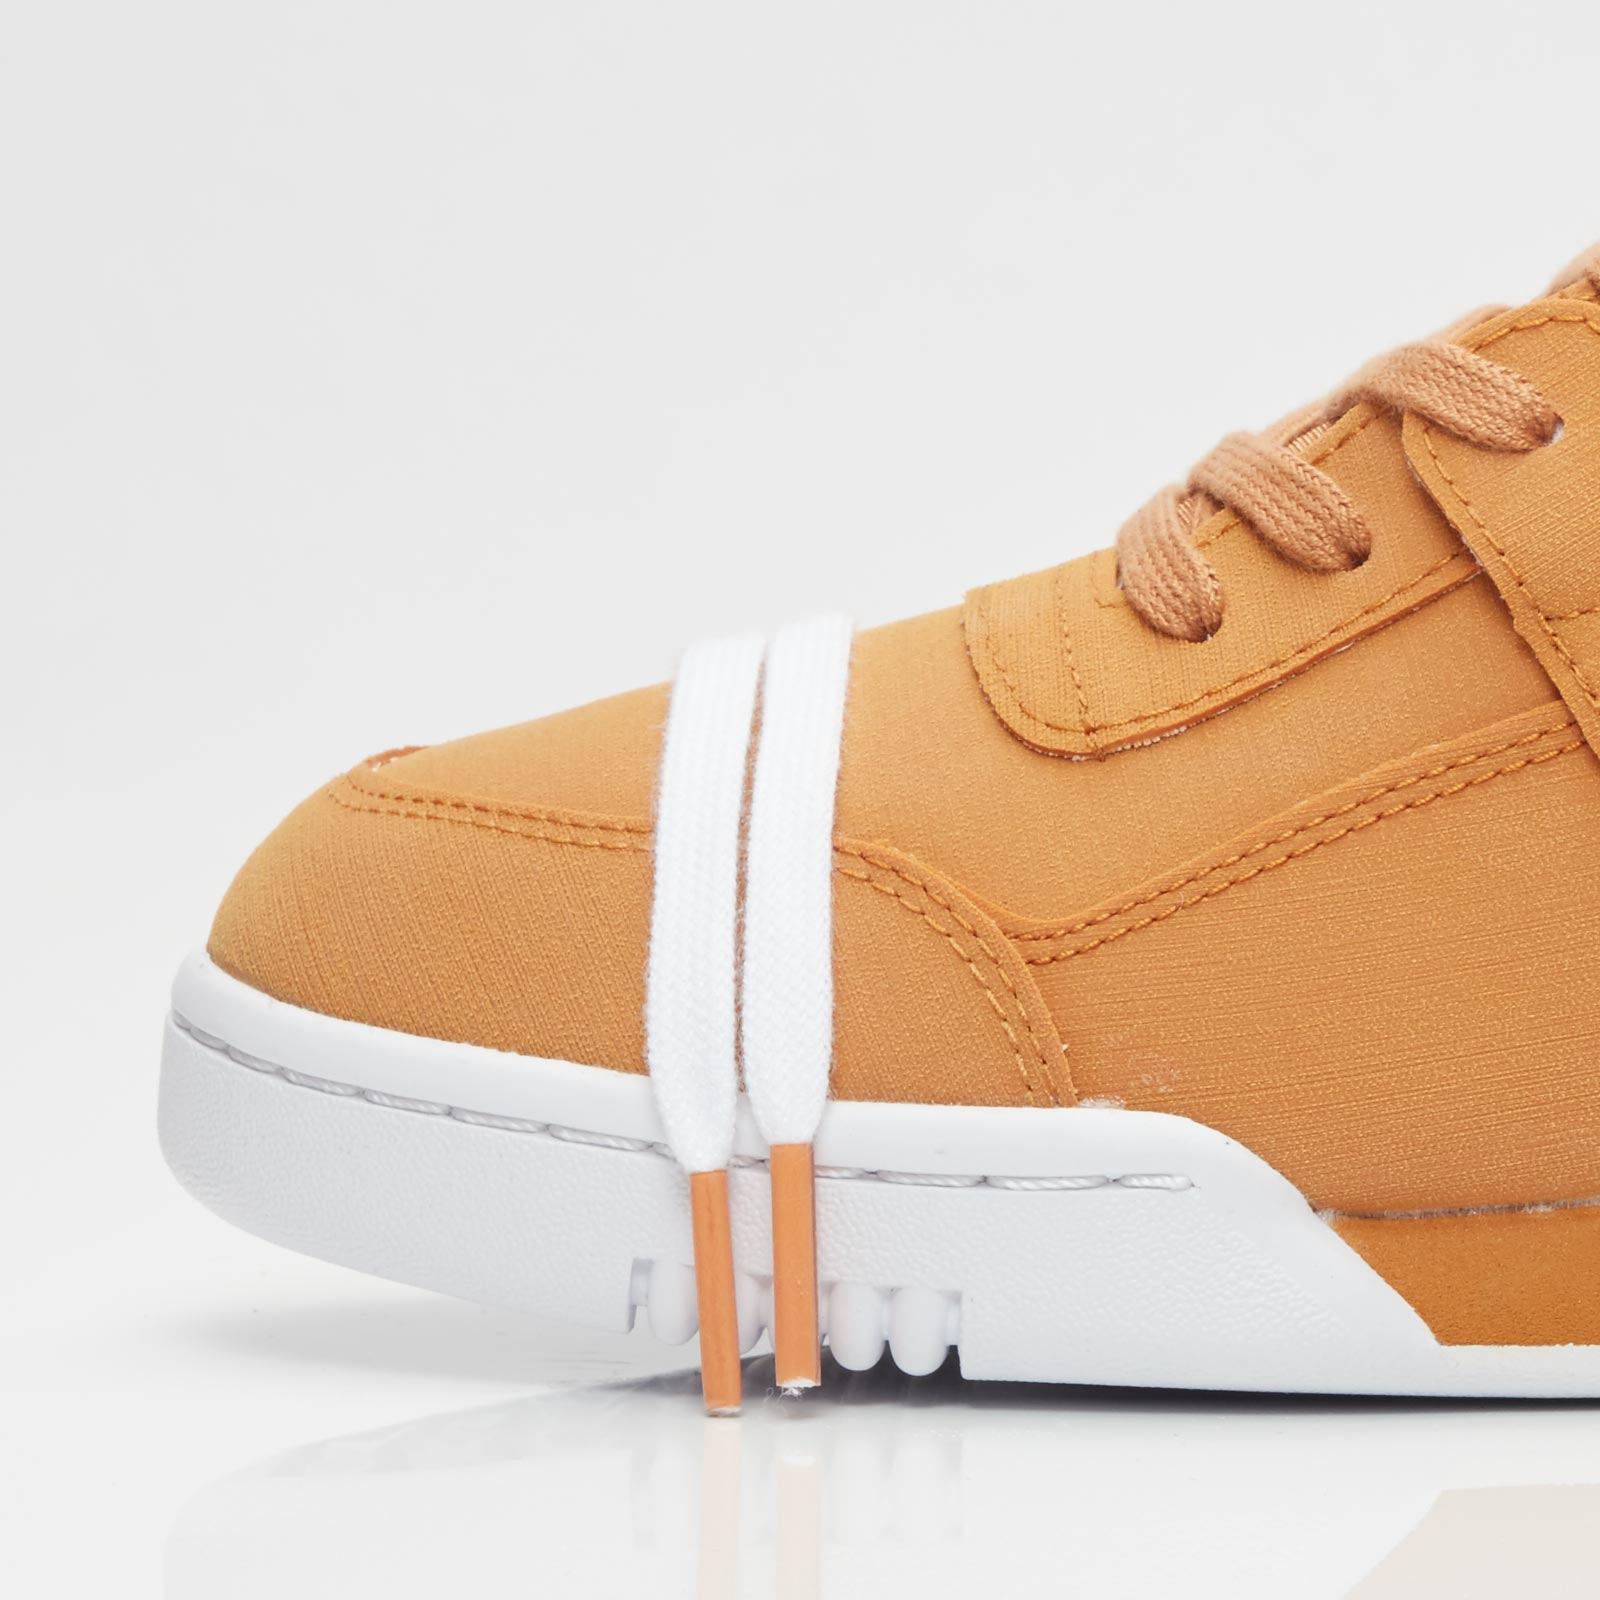 free shipping 52132 9a67a Reebok Workout Lo Plus x Packer - Bs9437 - Sneakersnstuff | sneakers ...